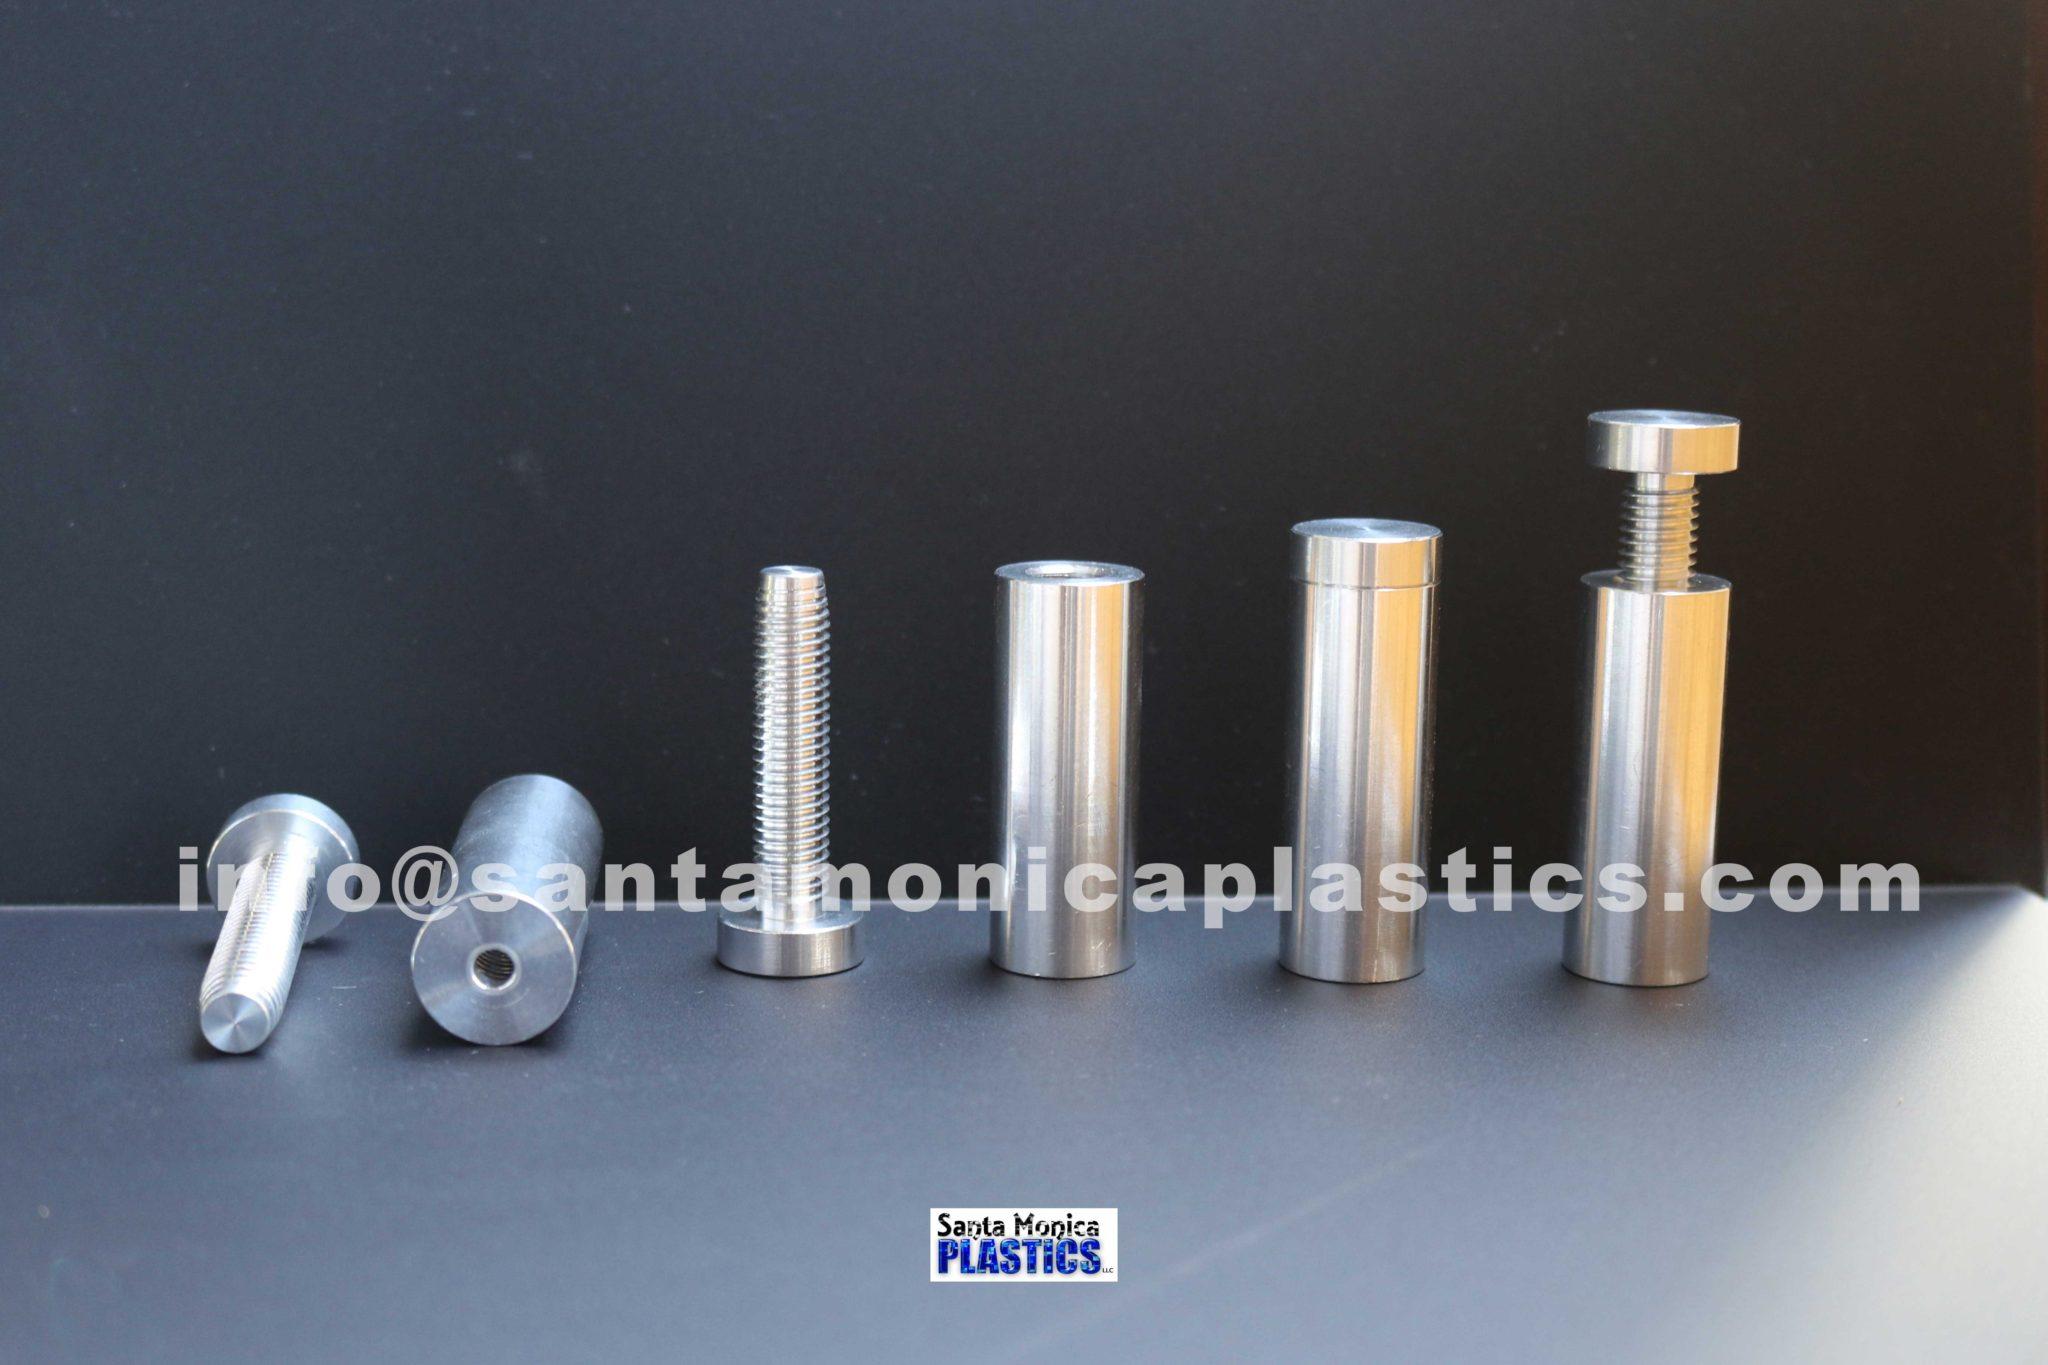 "Aluminum Standoffs #6 Size 0.75"" X 2.25"" (4 Pieces)"